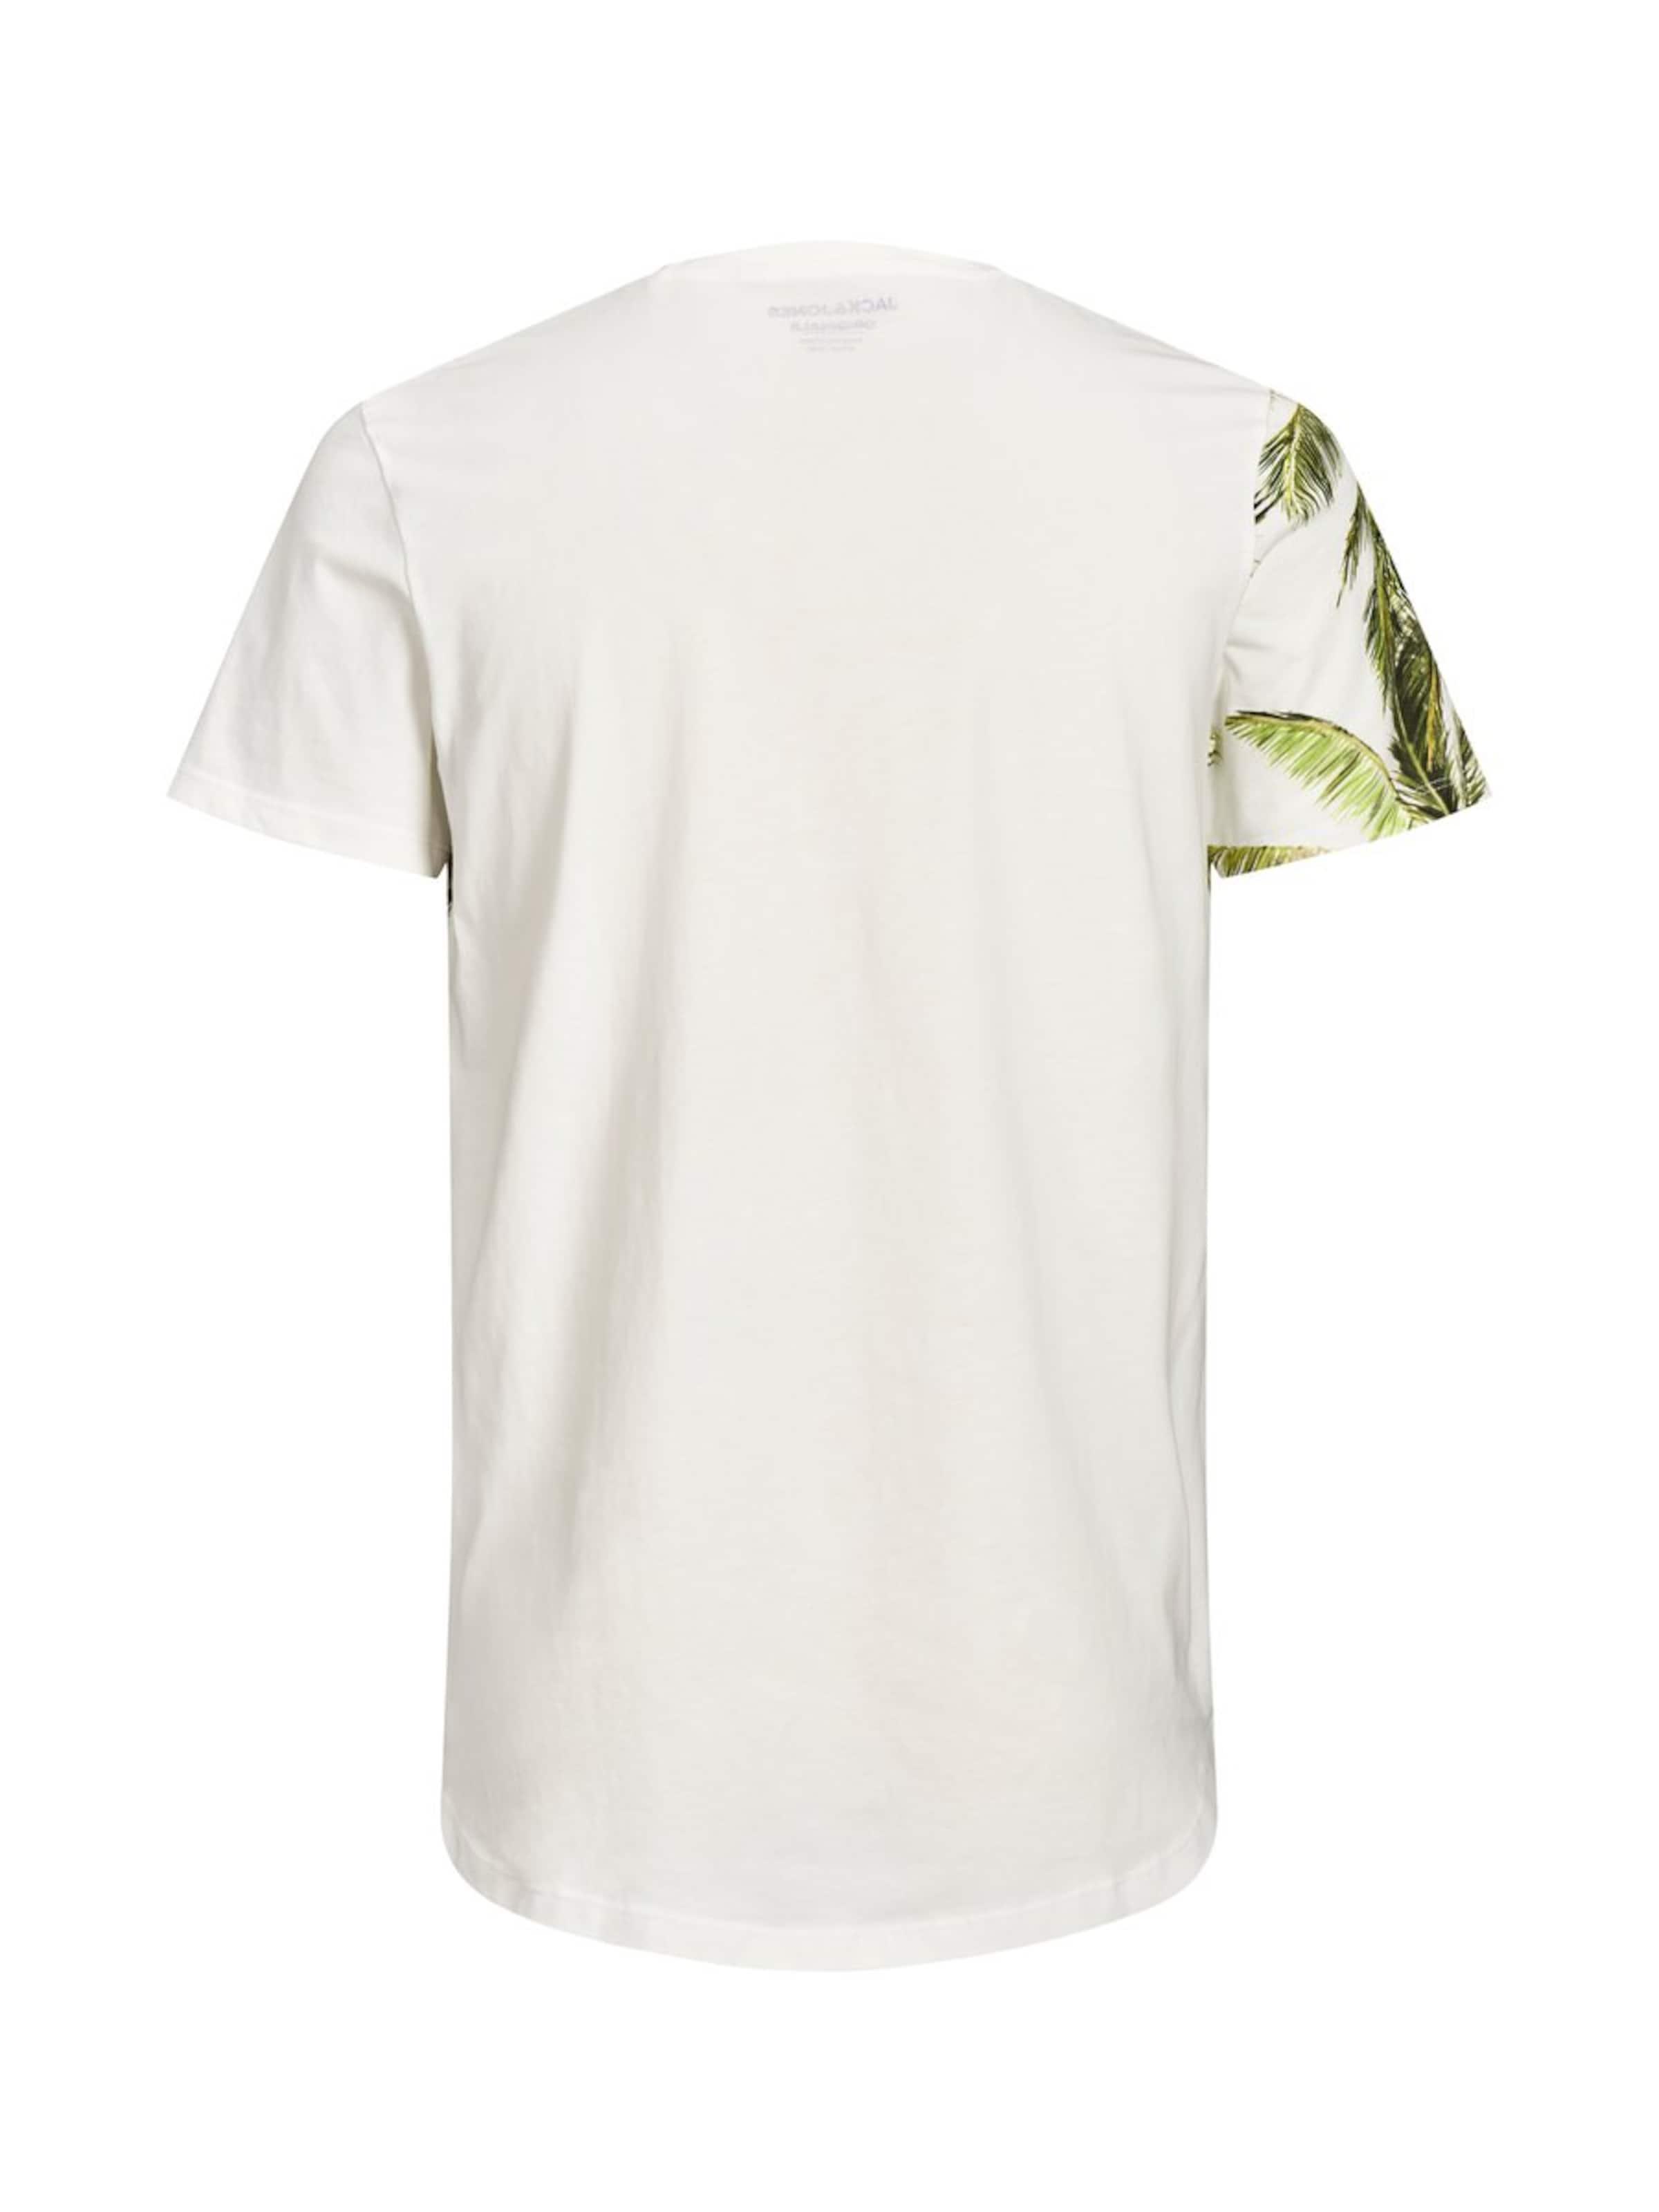 shirt In CremeGrün Jackamp; Jones T Weiß lFK1Jc